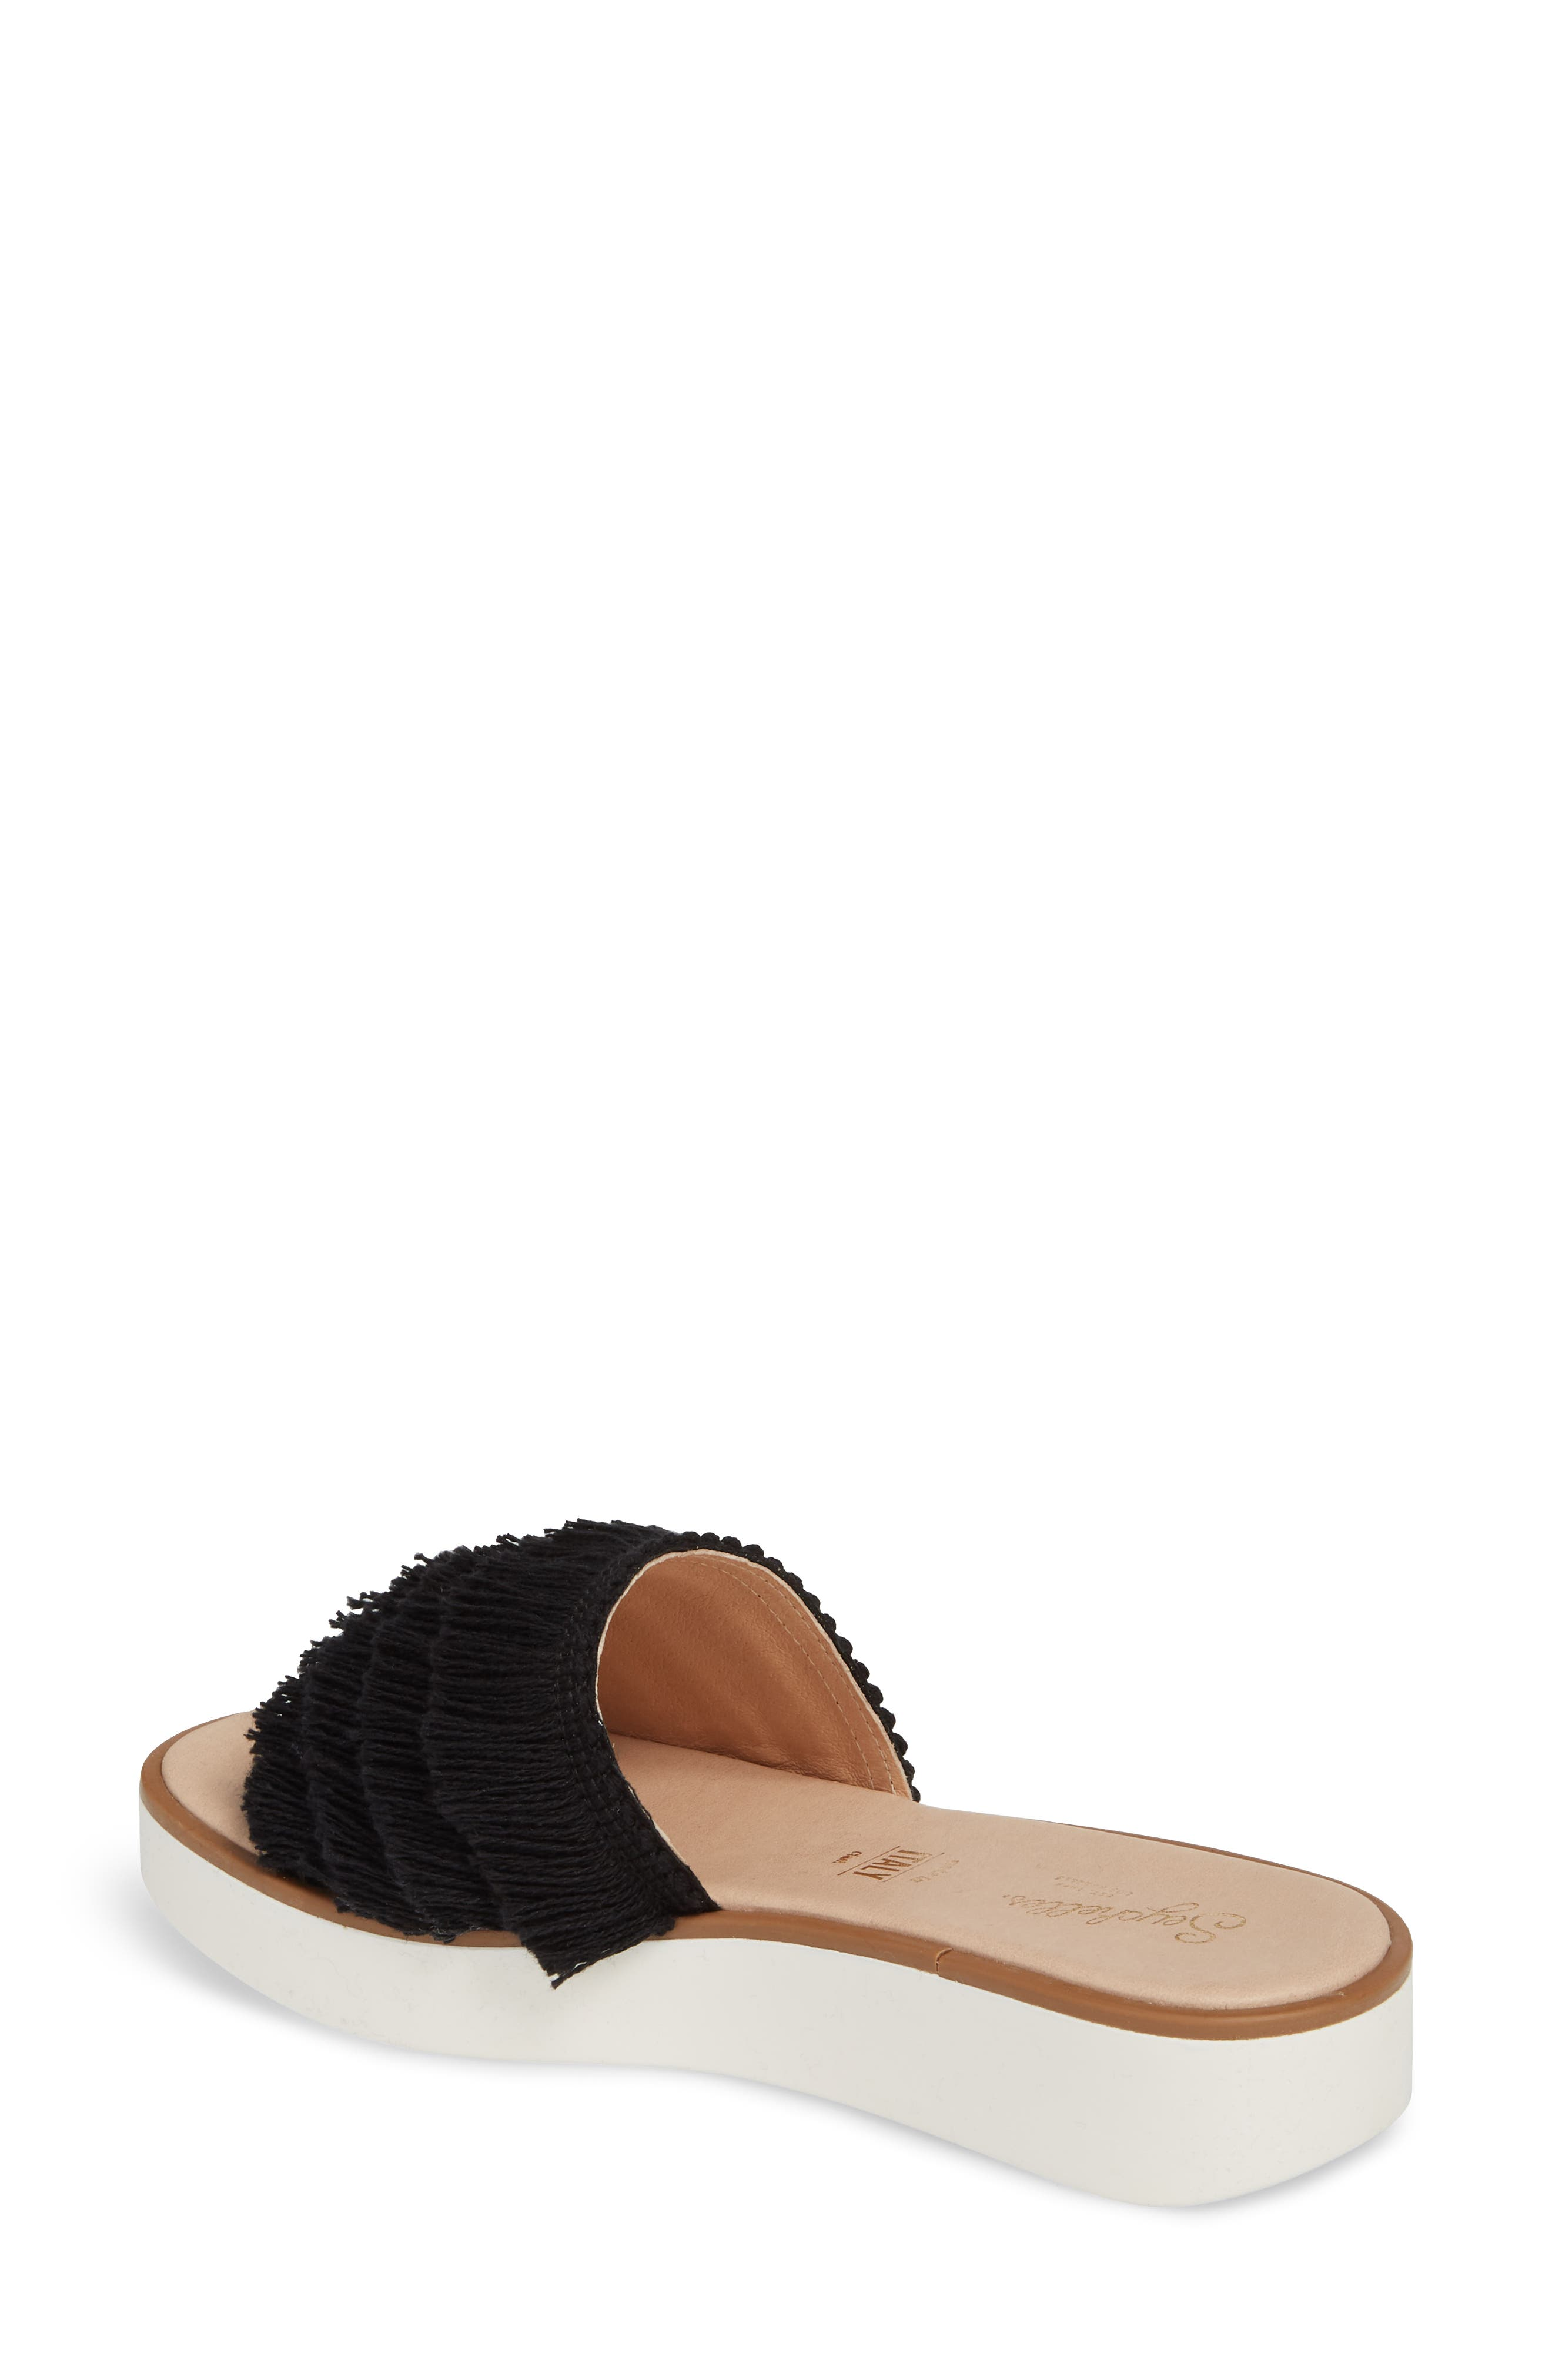 Well Rested Ruffle Slide Sandal,                             Alternate thumbnail 2, color,                             Black Fabric